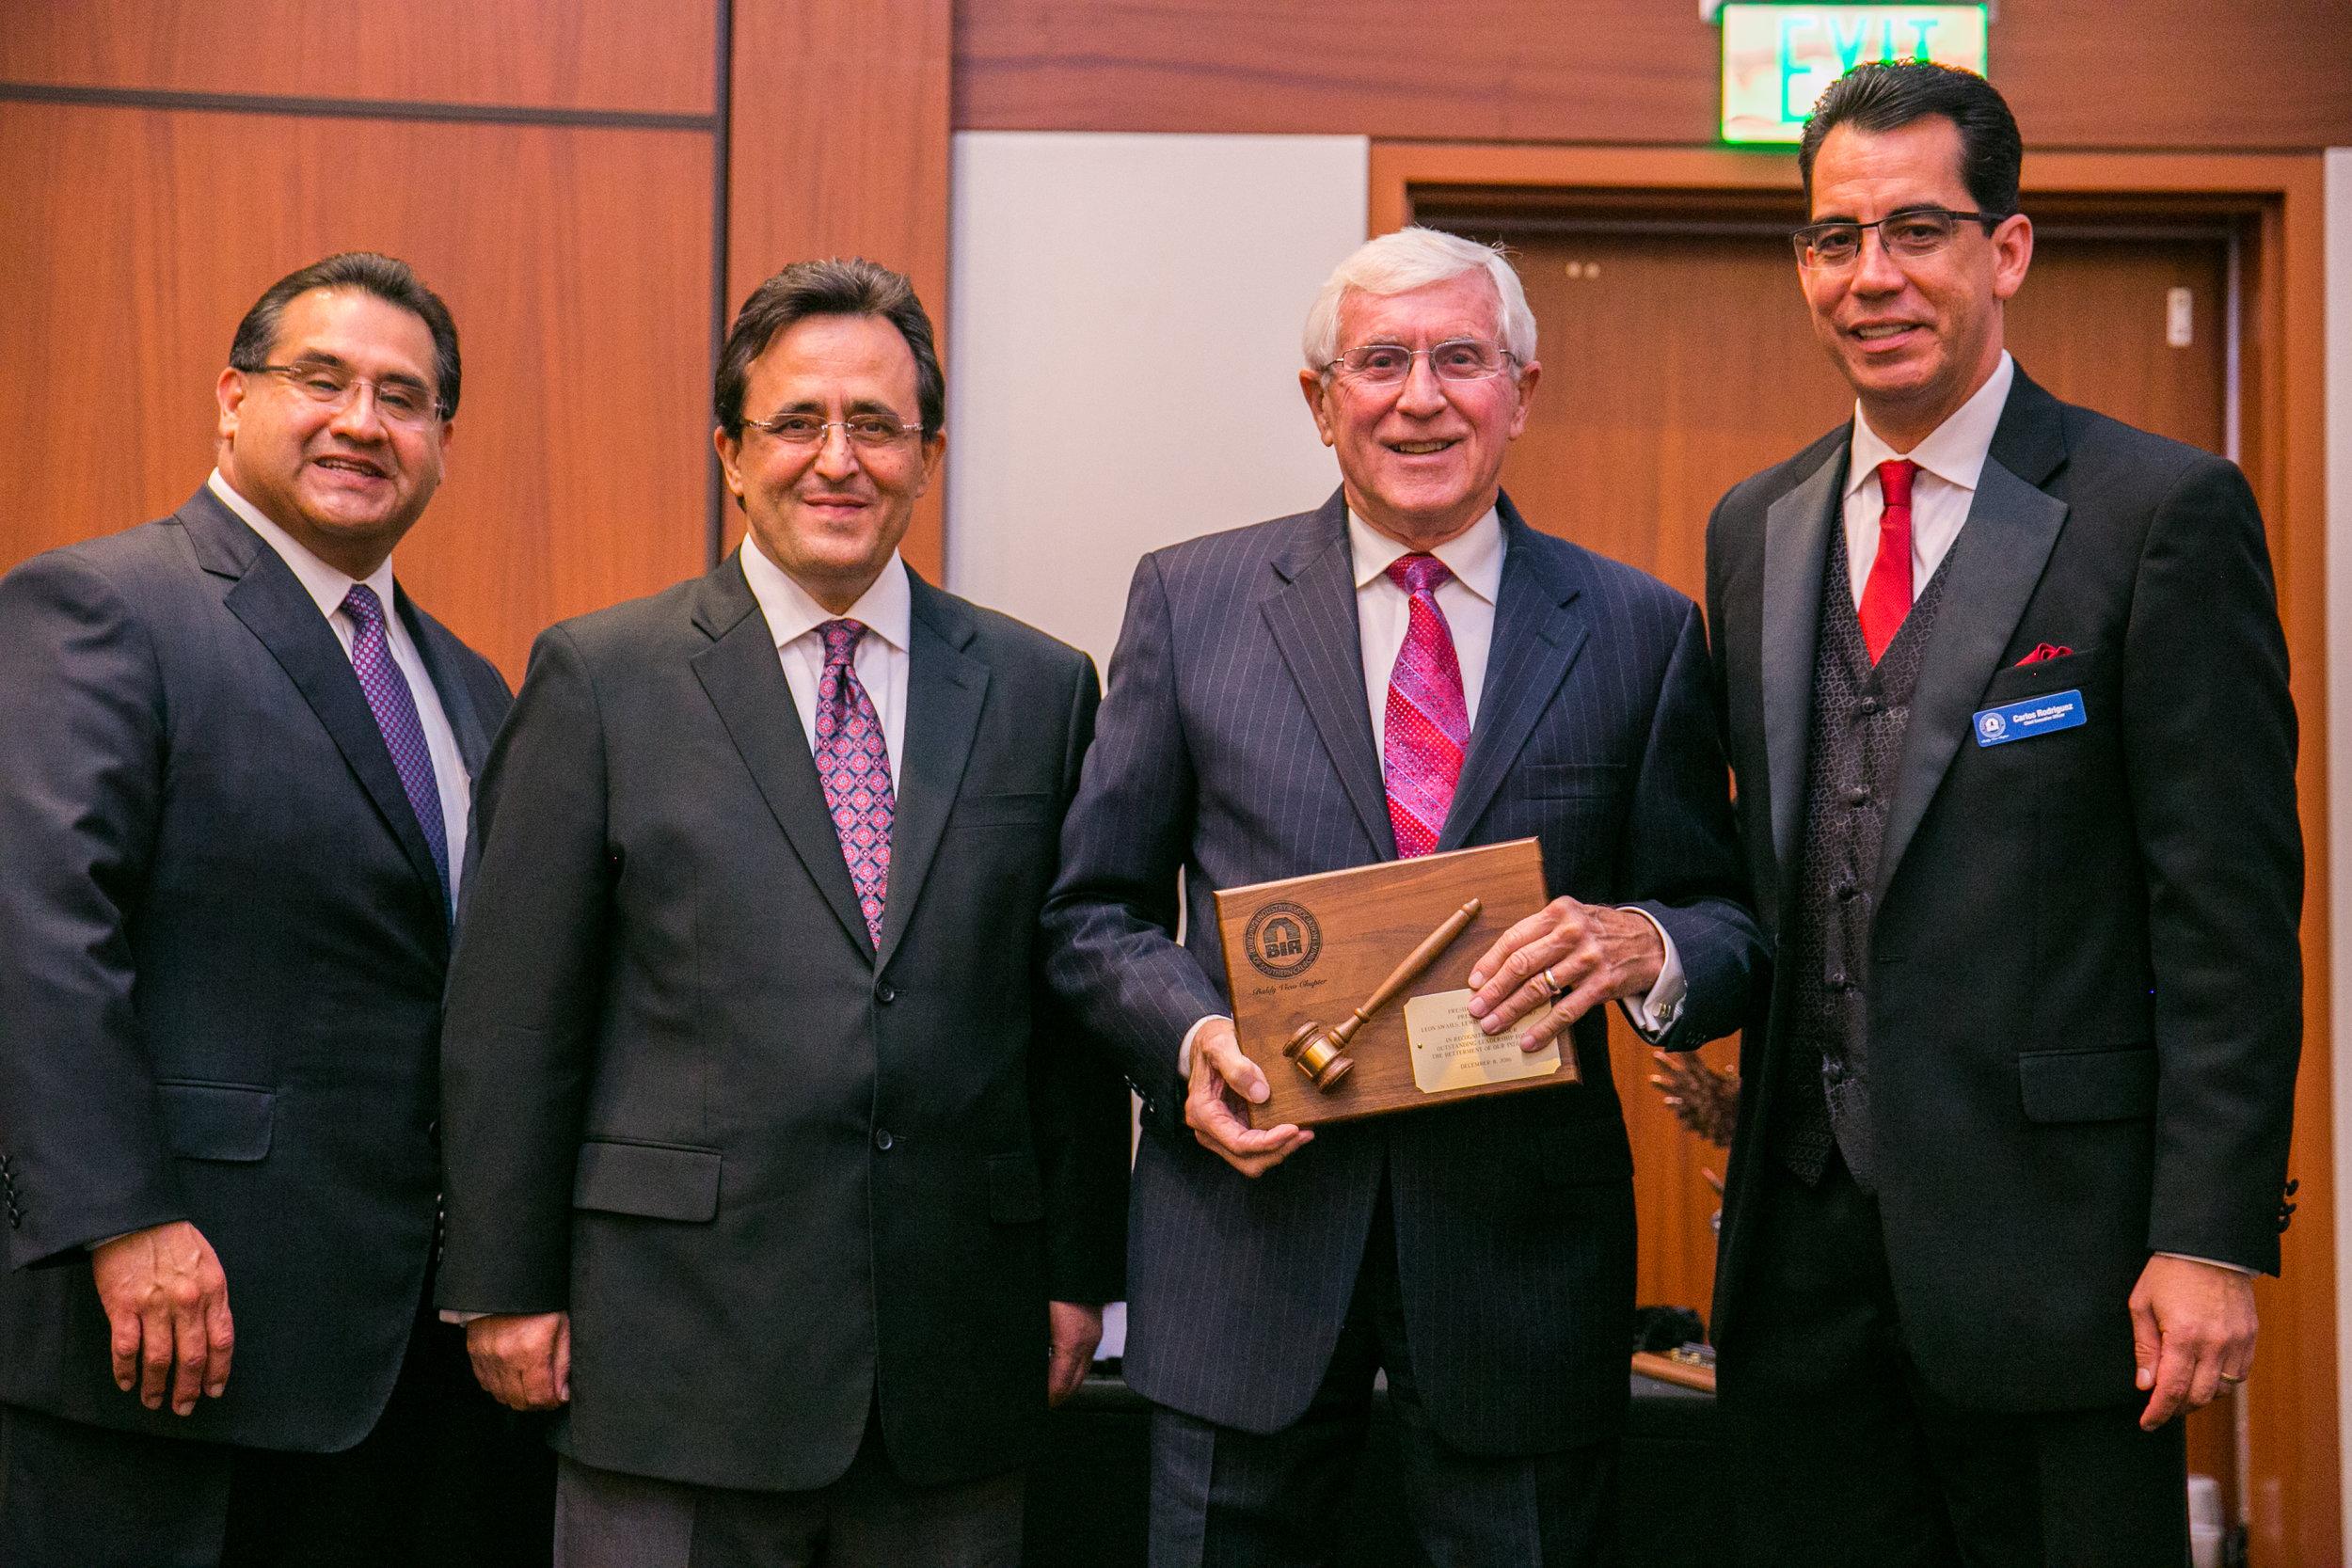 <b>2016 President's Award</b><br>Leon Swails, Lewis Management Corp.